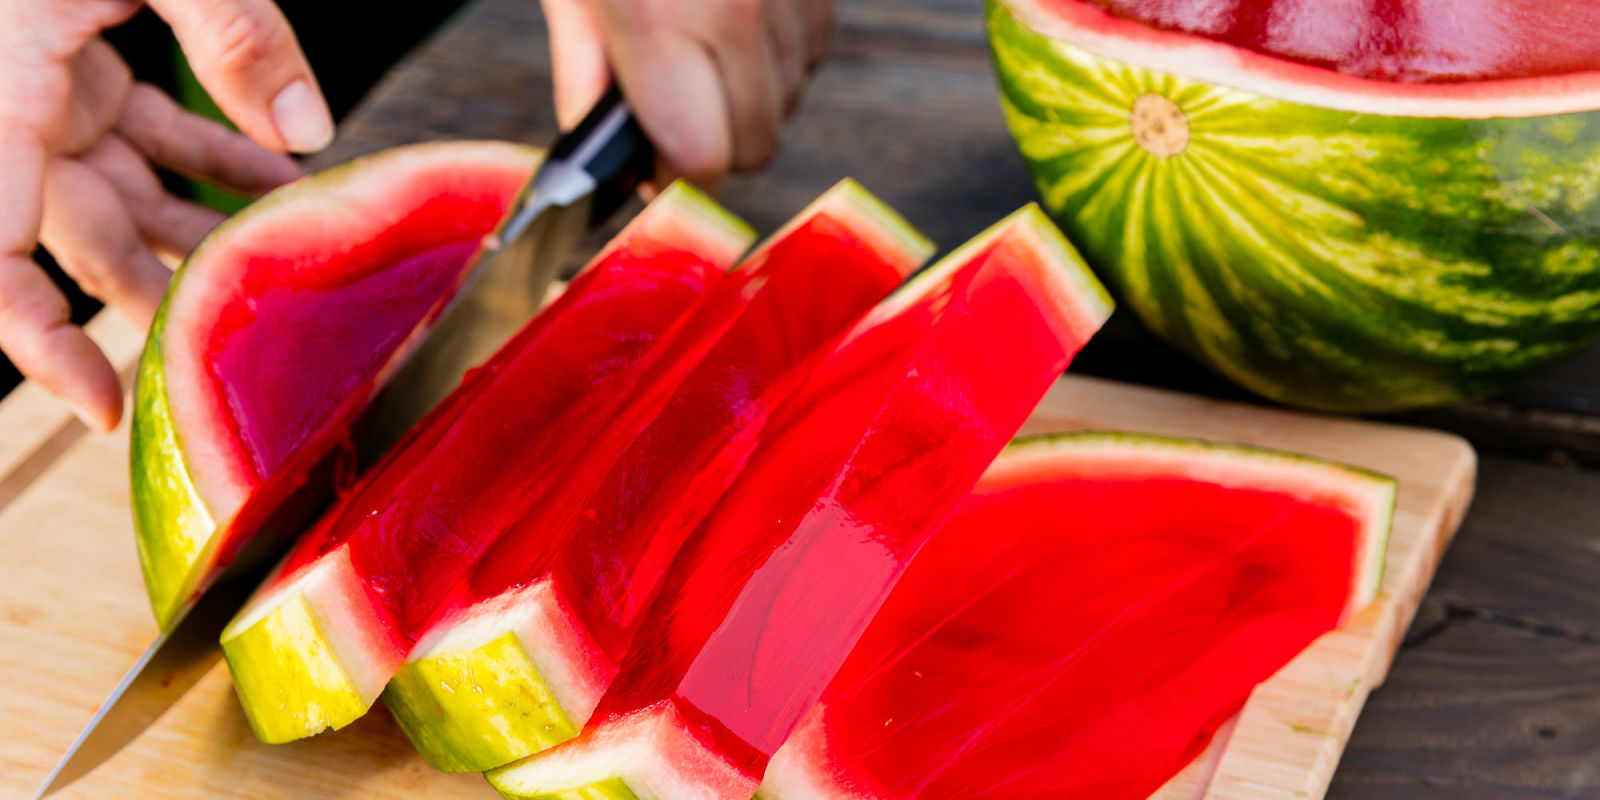 Lindsay Funston Watermelon Jell O Shots Giant Watermelon Jell O Shot